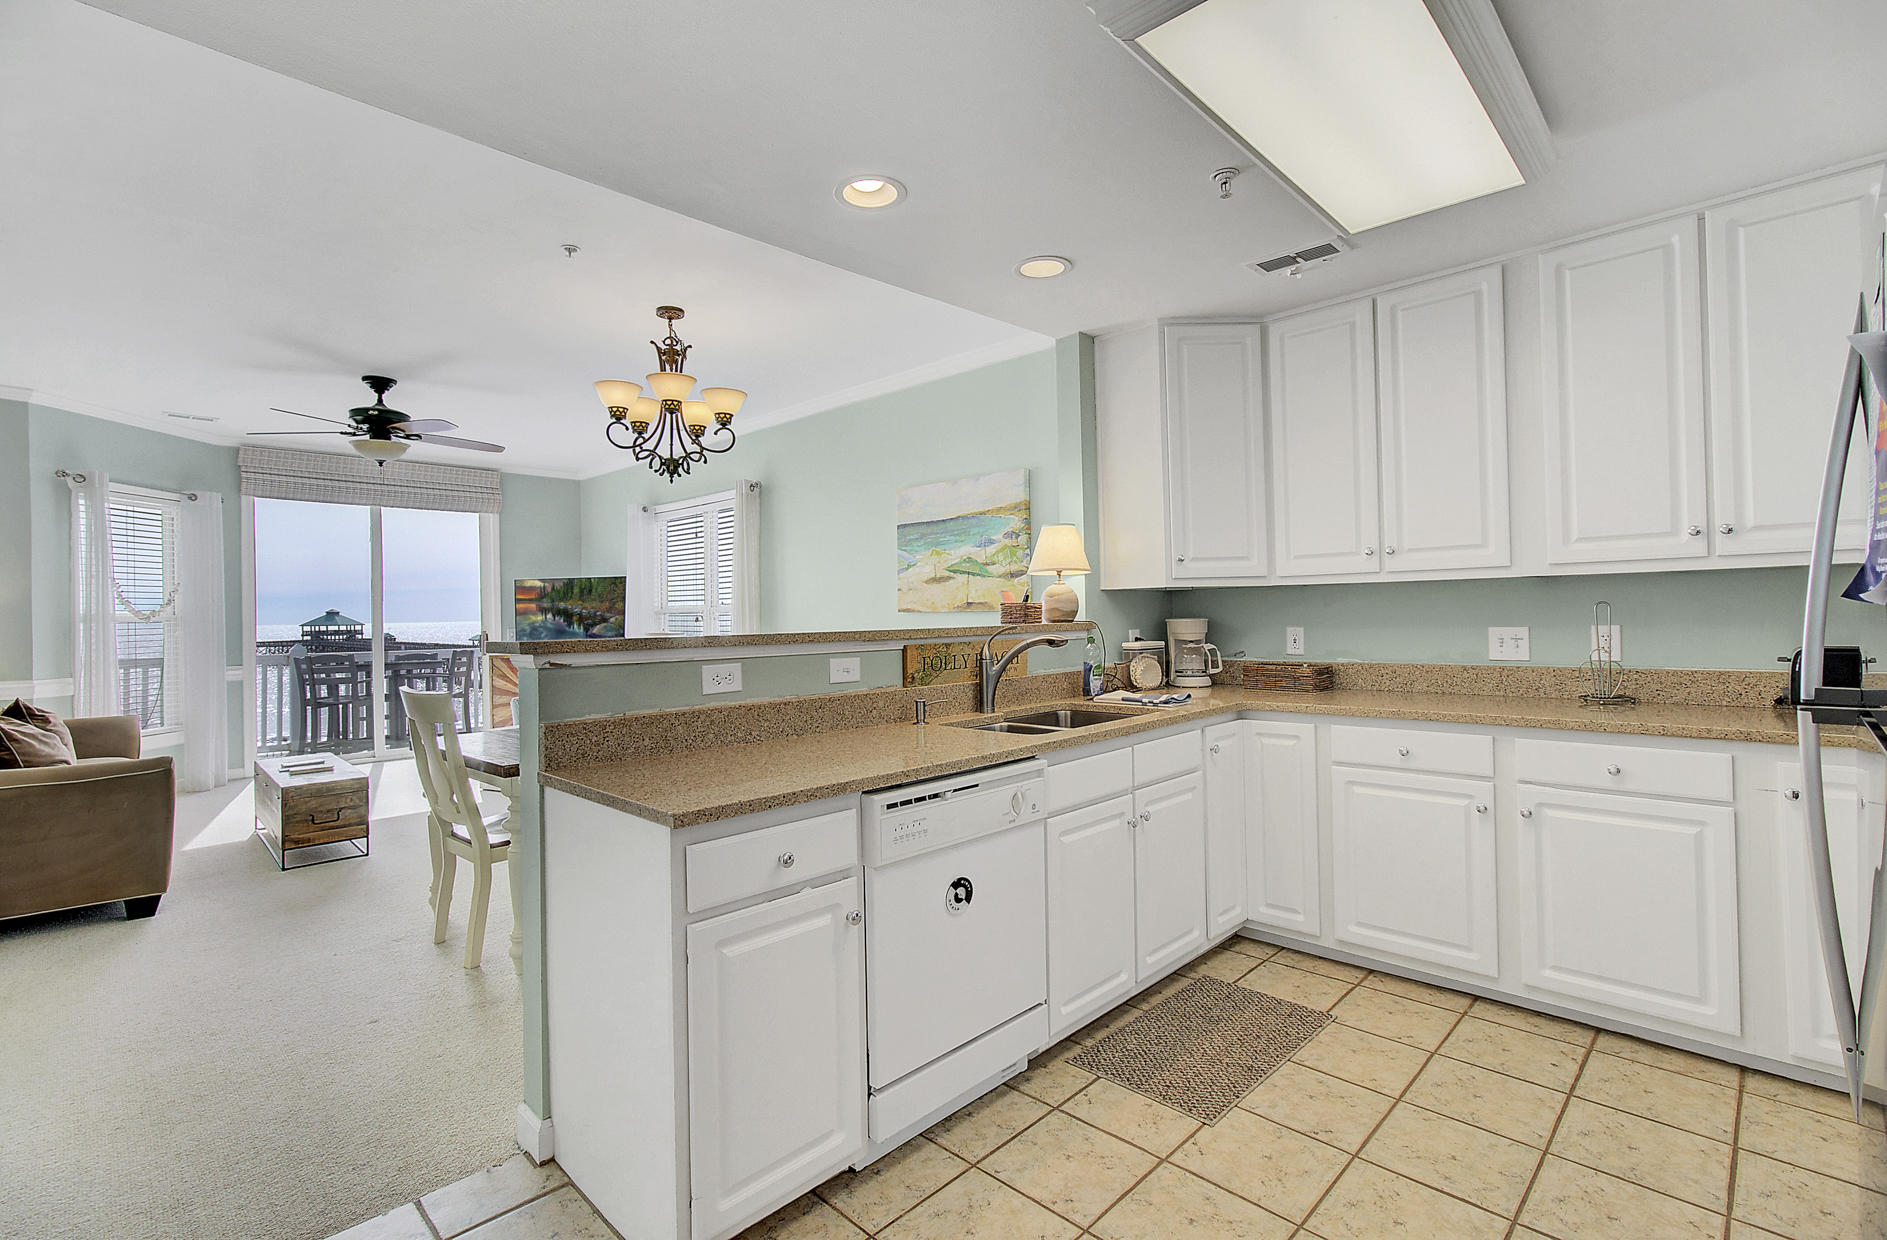 Seaside Villas I Homes For Sale - 111 Arctic, Folly Beach, SC - 10